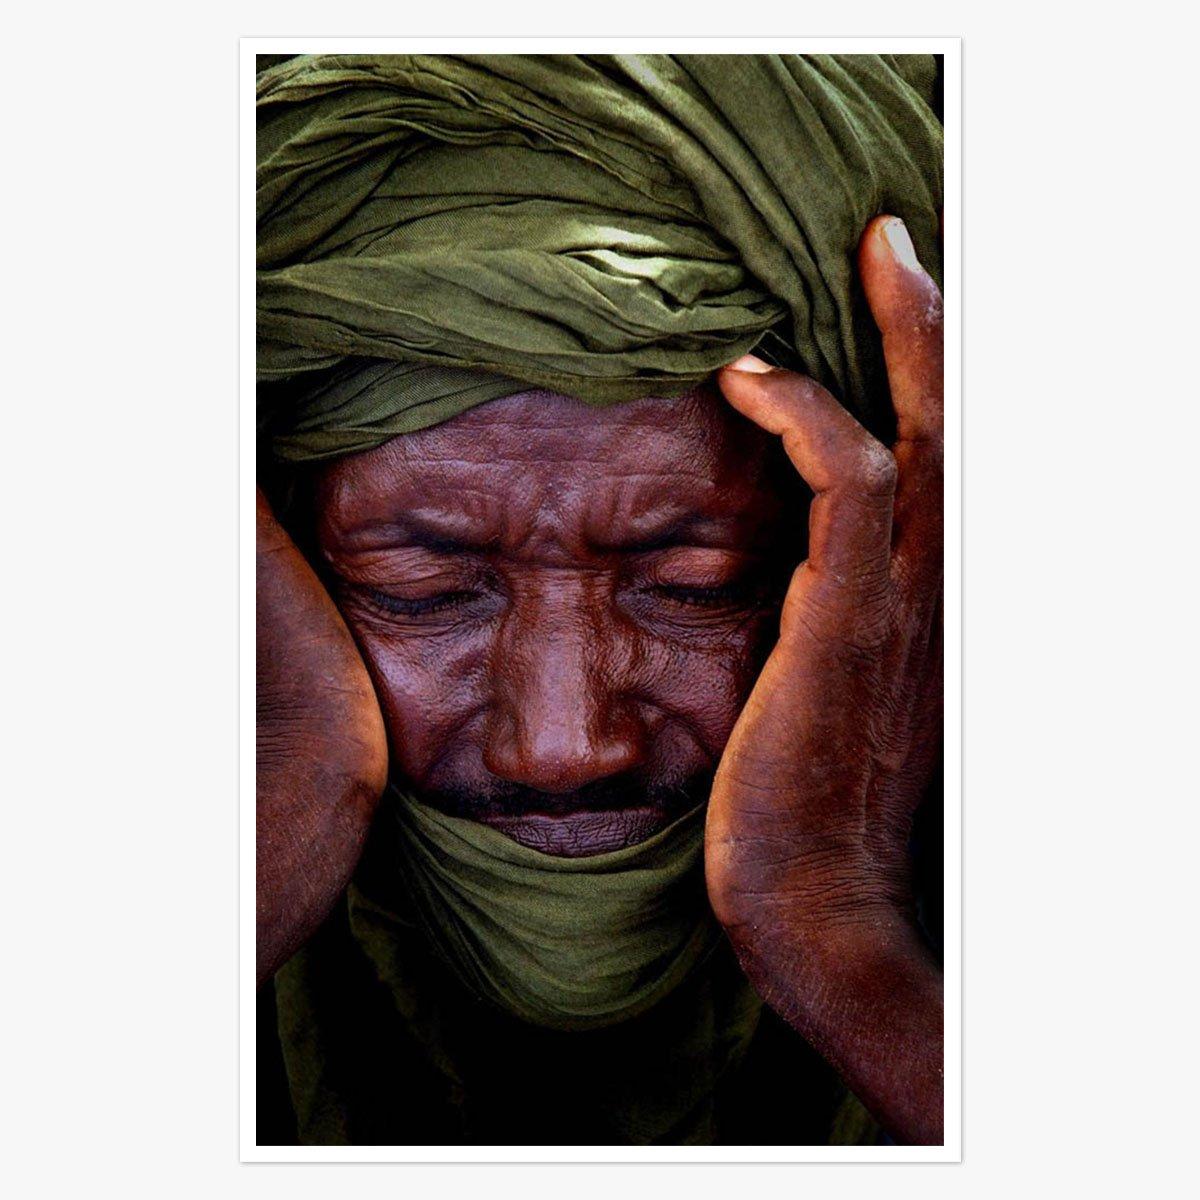 A Niger Tuareg Member by Tom Pilston